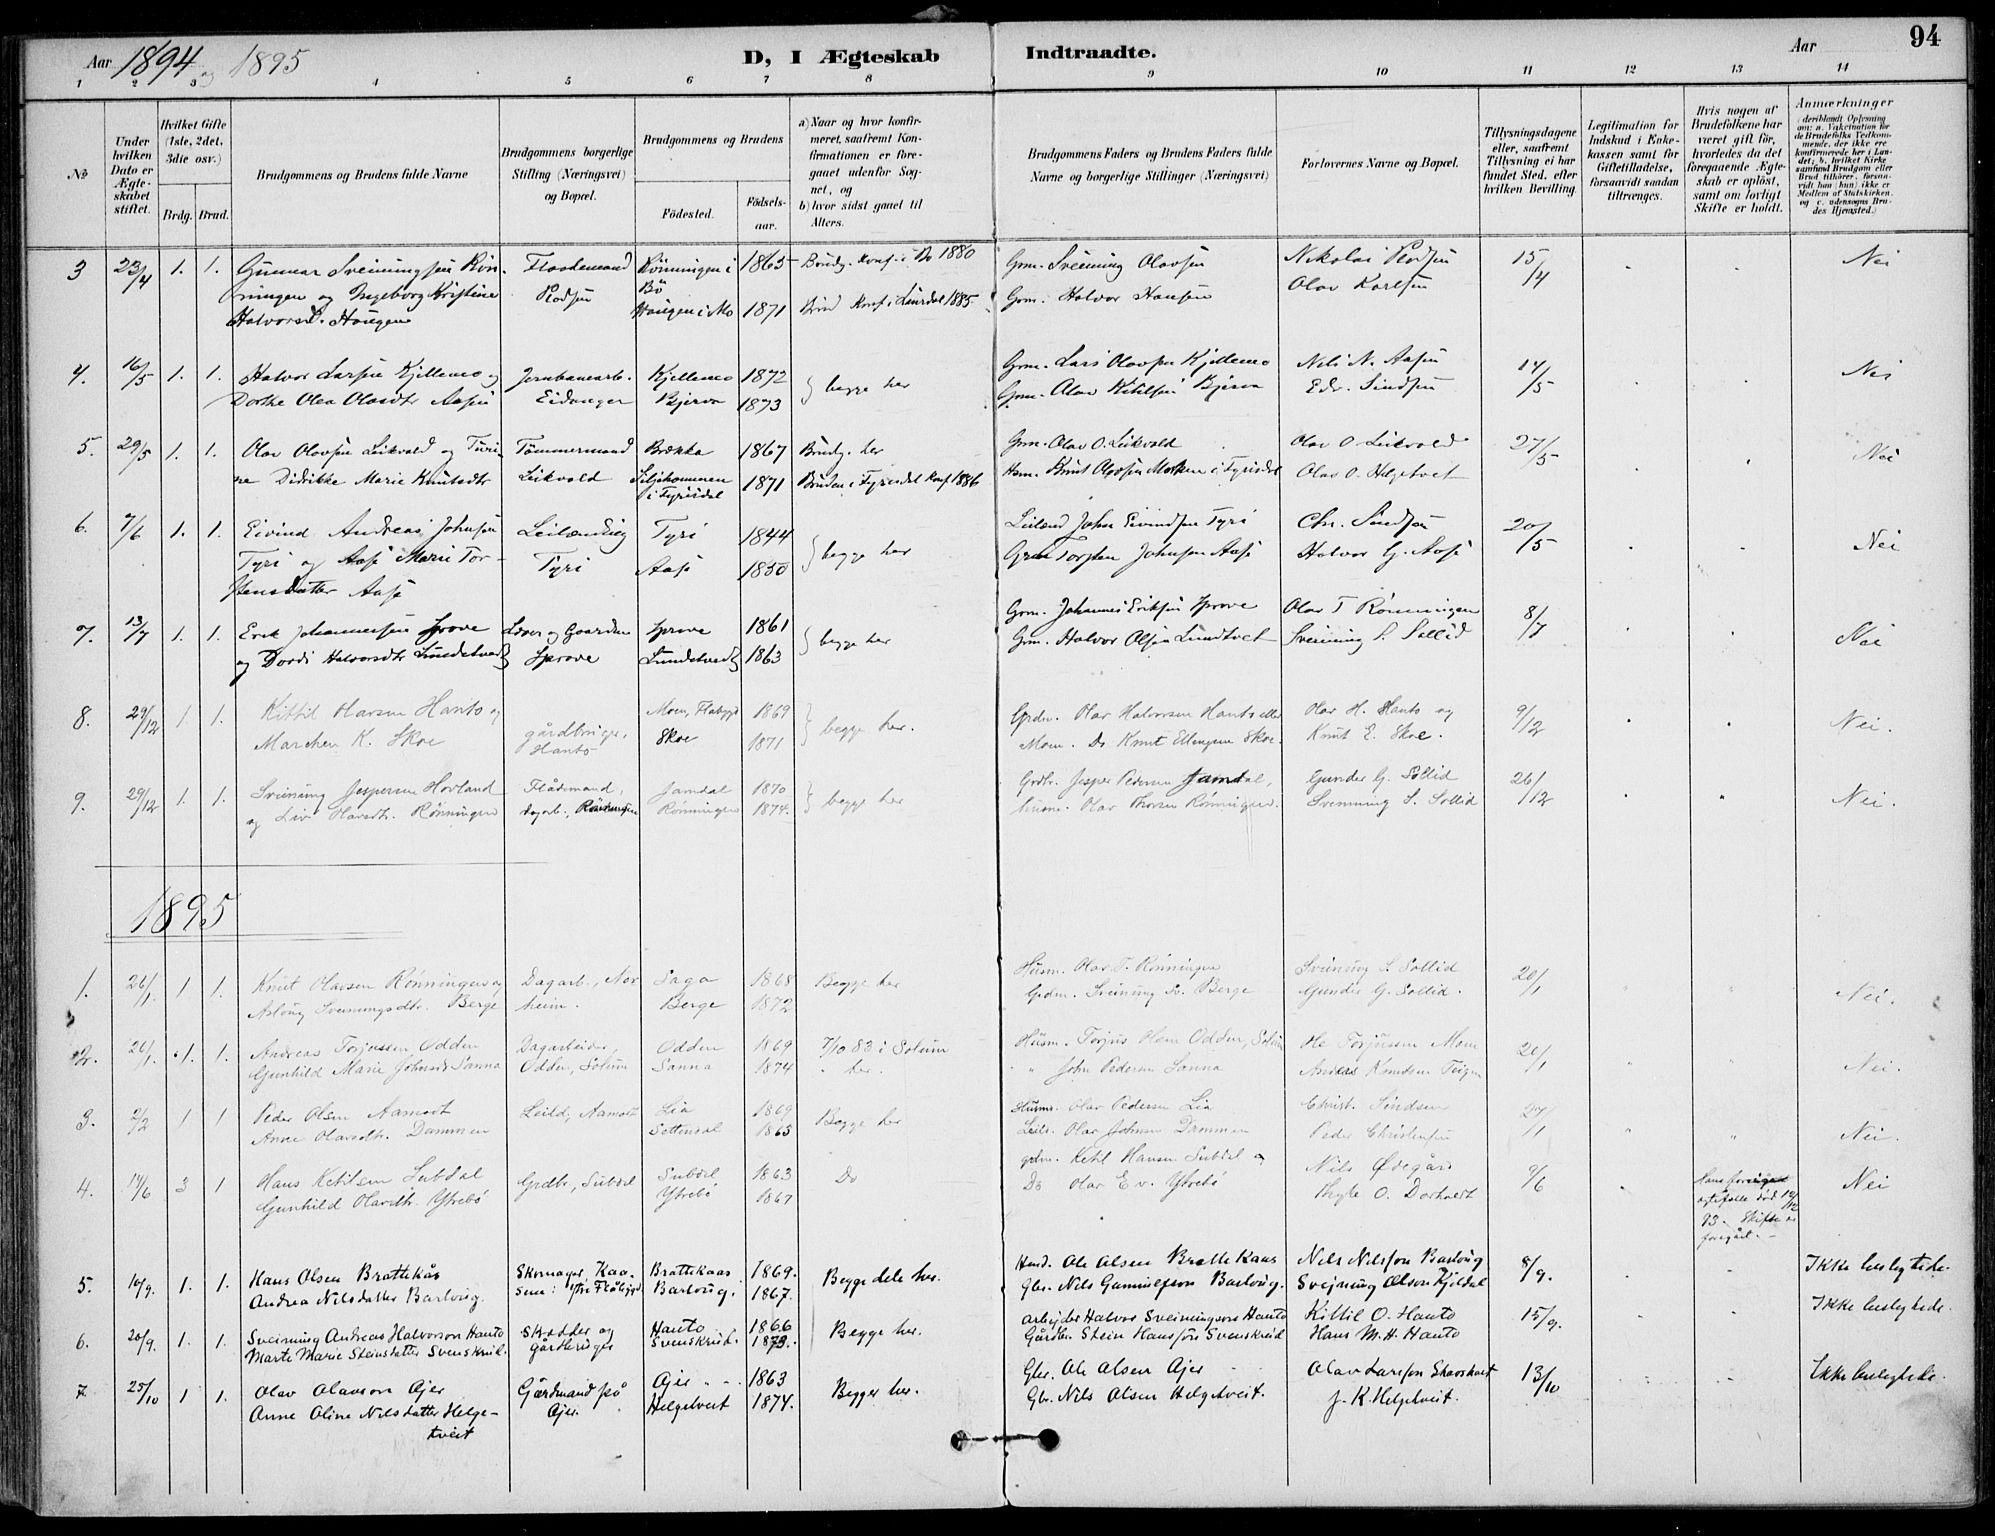 SAKO, Lunde kirkebøker, F/Fa/L0003: Ministerialbok nr. I 3, 1893-1902, s. 94